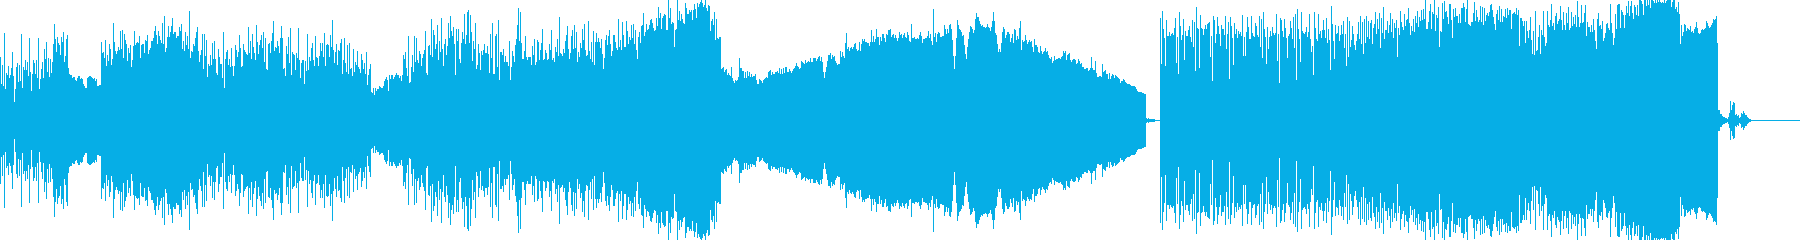 EDM  少しアンダーグラウンド的なト…の再生済みの波形